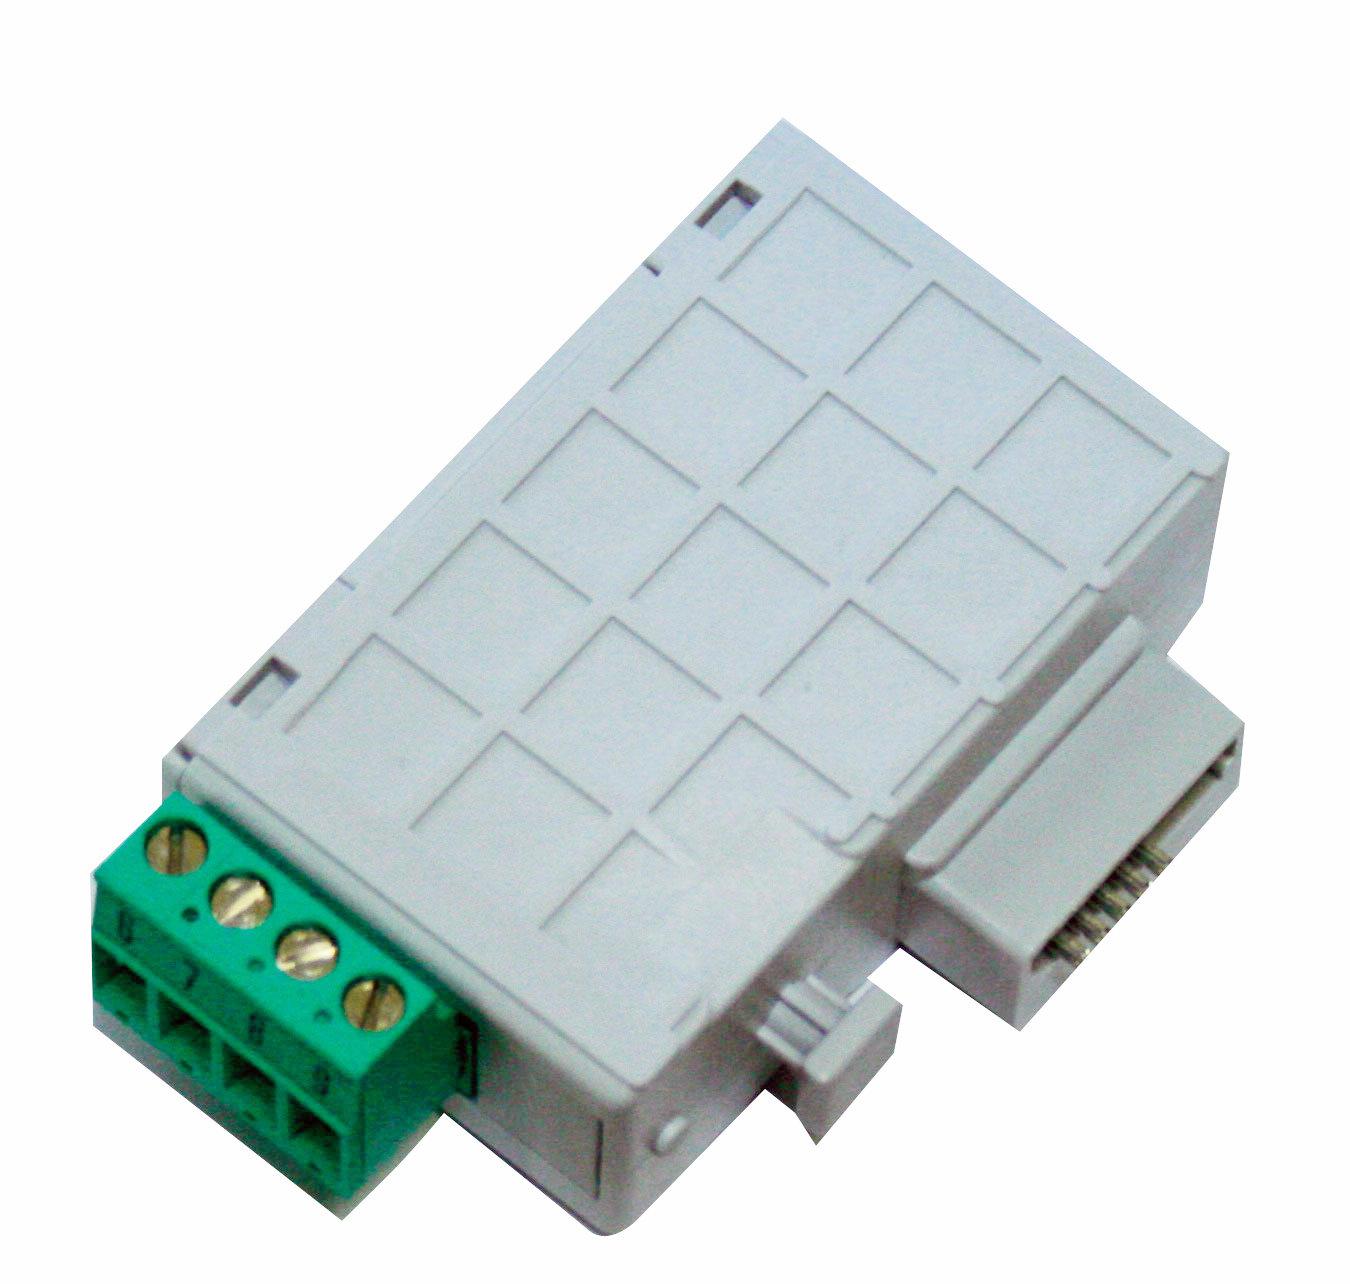 1 Stk Steckmodul für Alarmausgang zu NA96 und NA96+ MGF3900A--